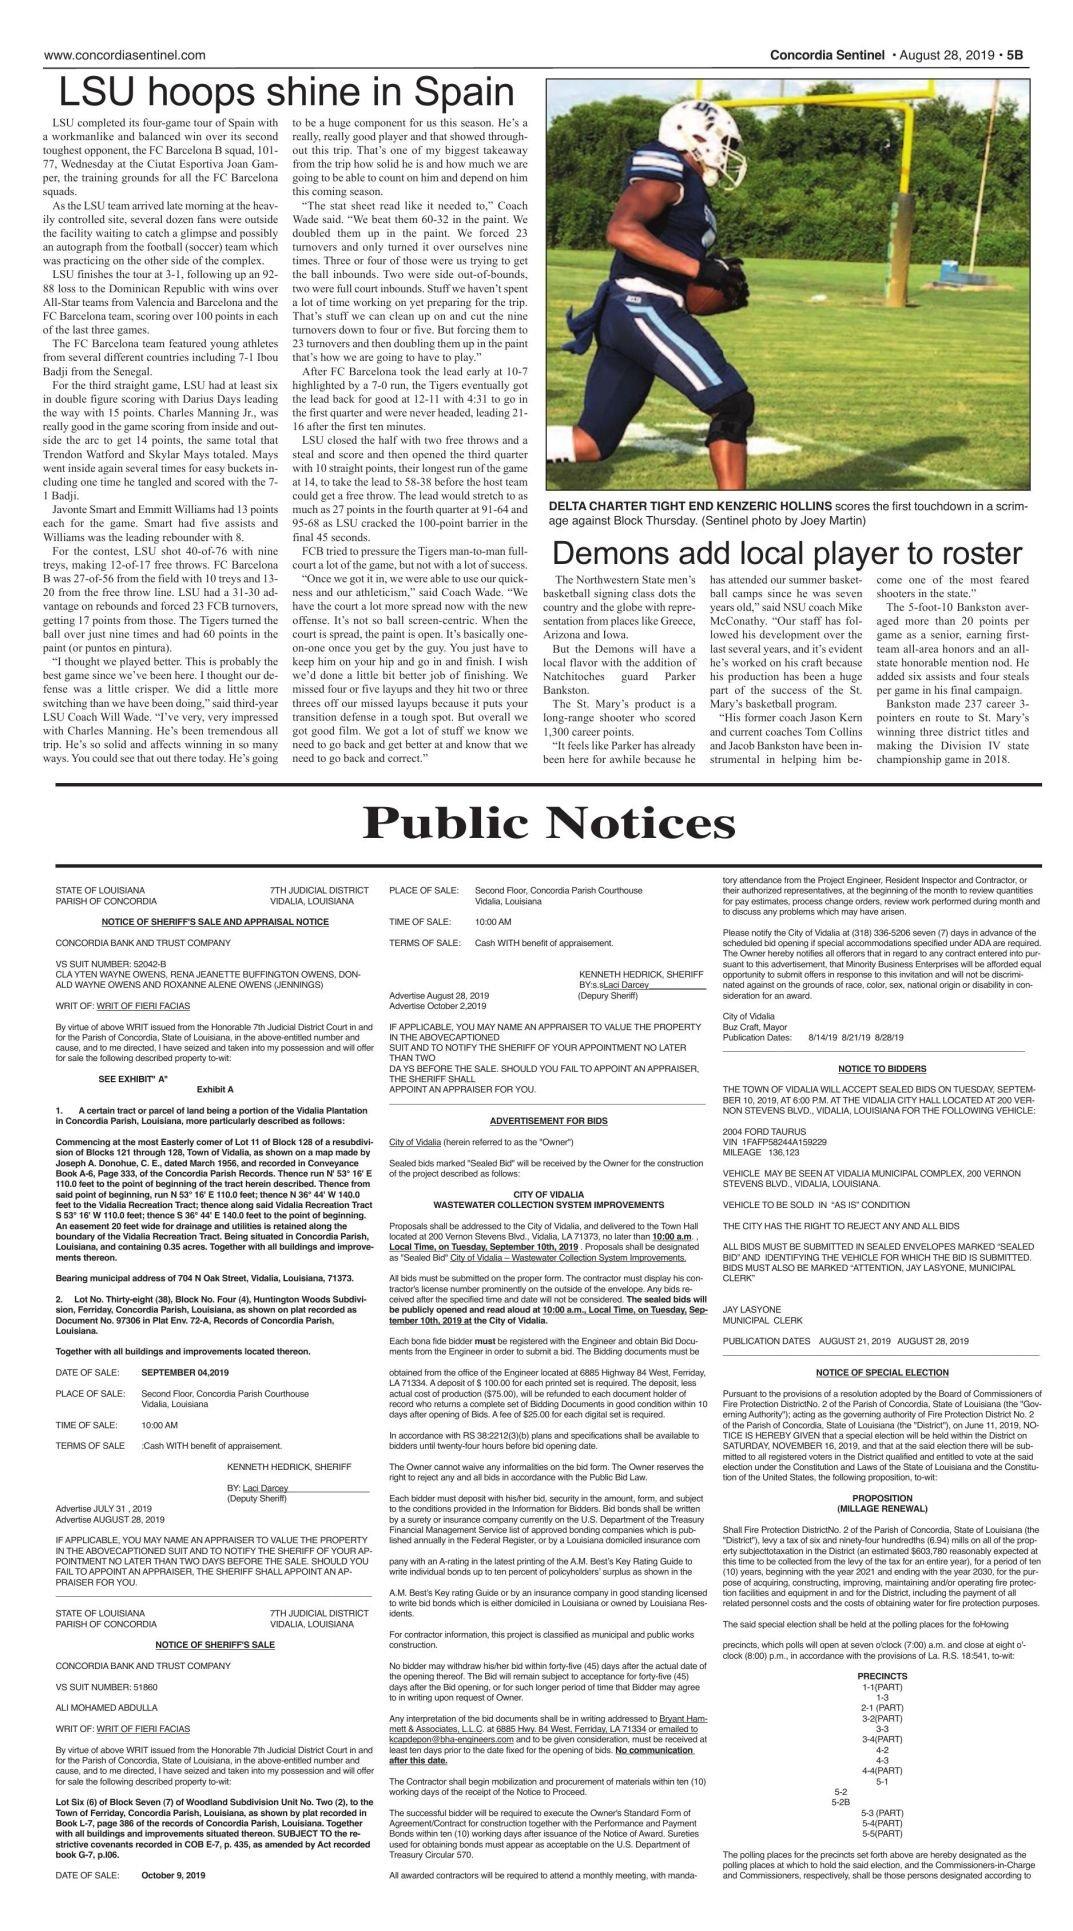 Public Notices - August 28, 2019